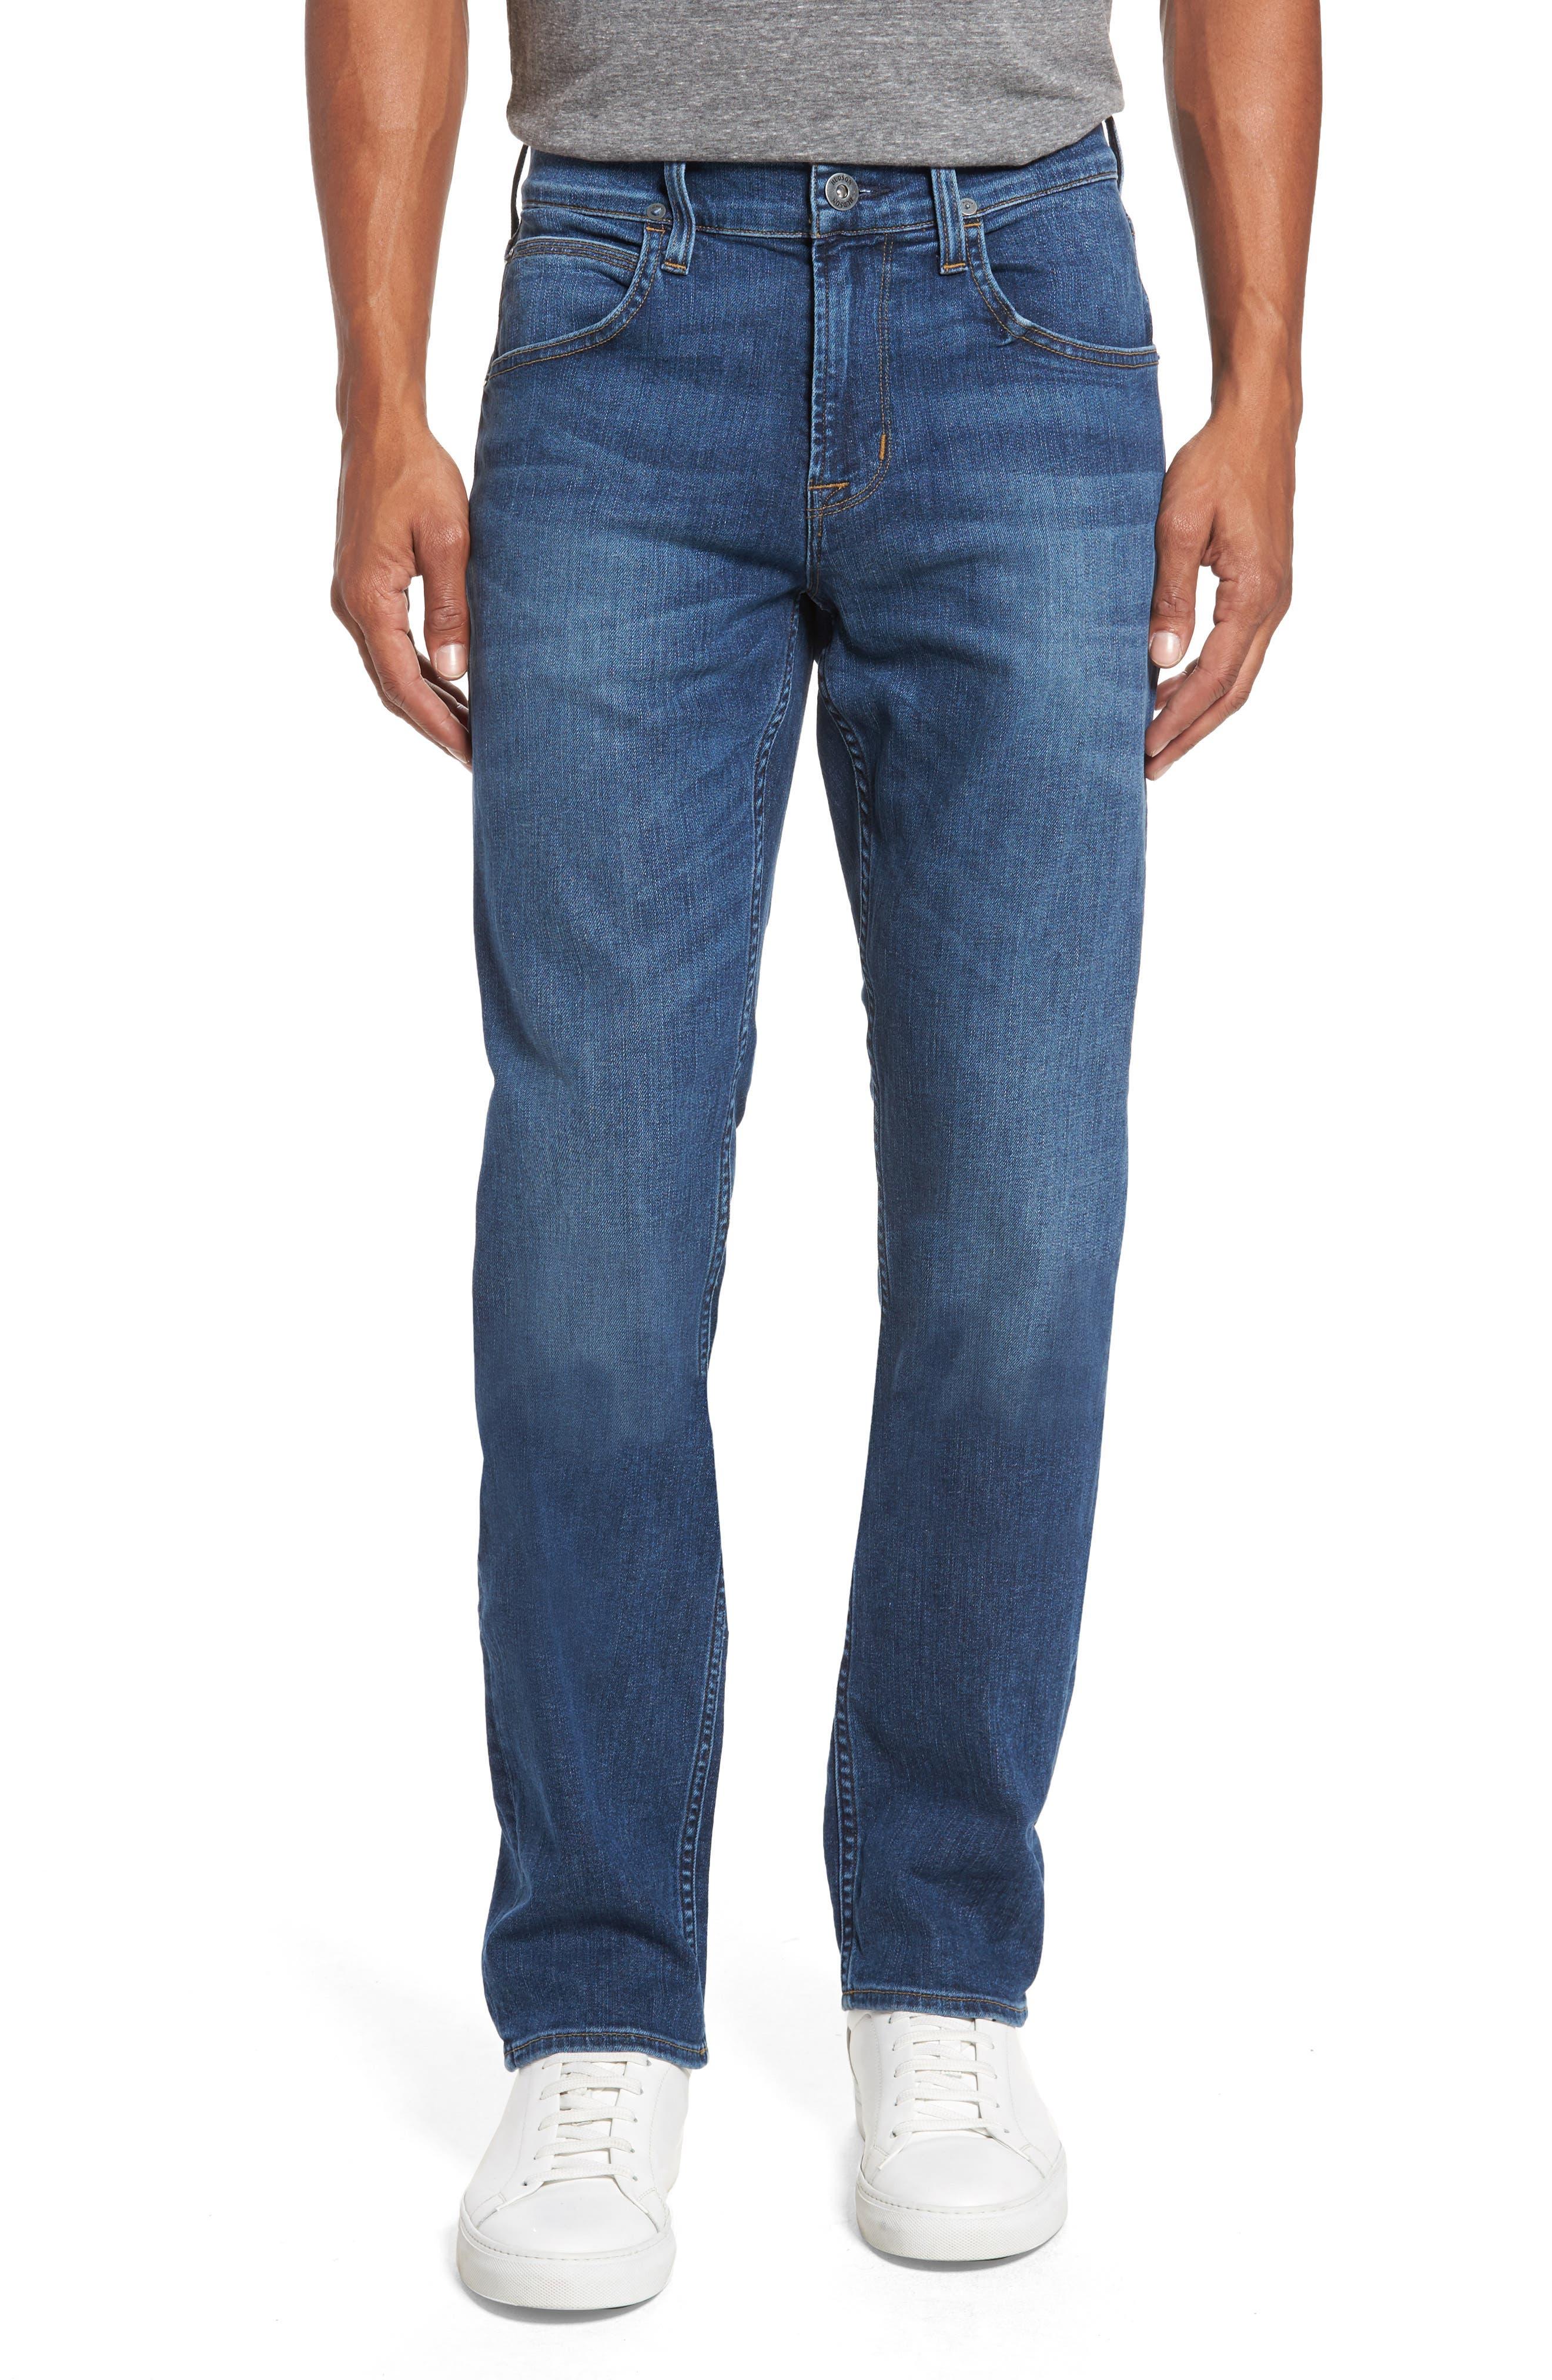 Byron Slim Straight Leg Jeans,                             Main thumbnail 1, color,                             421